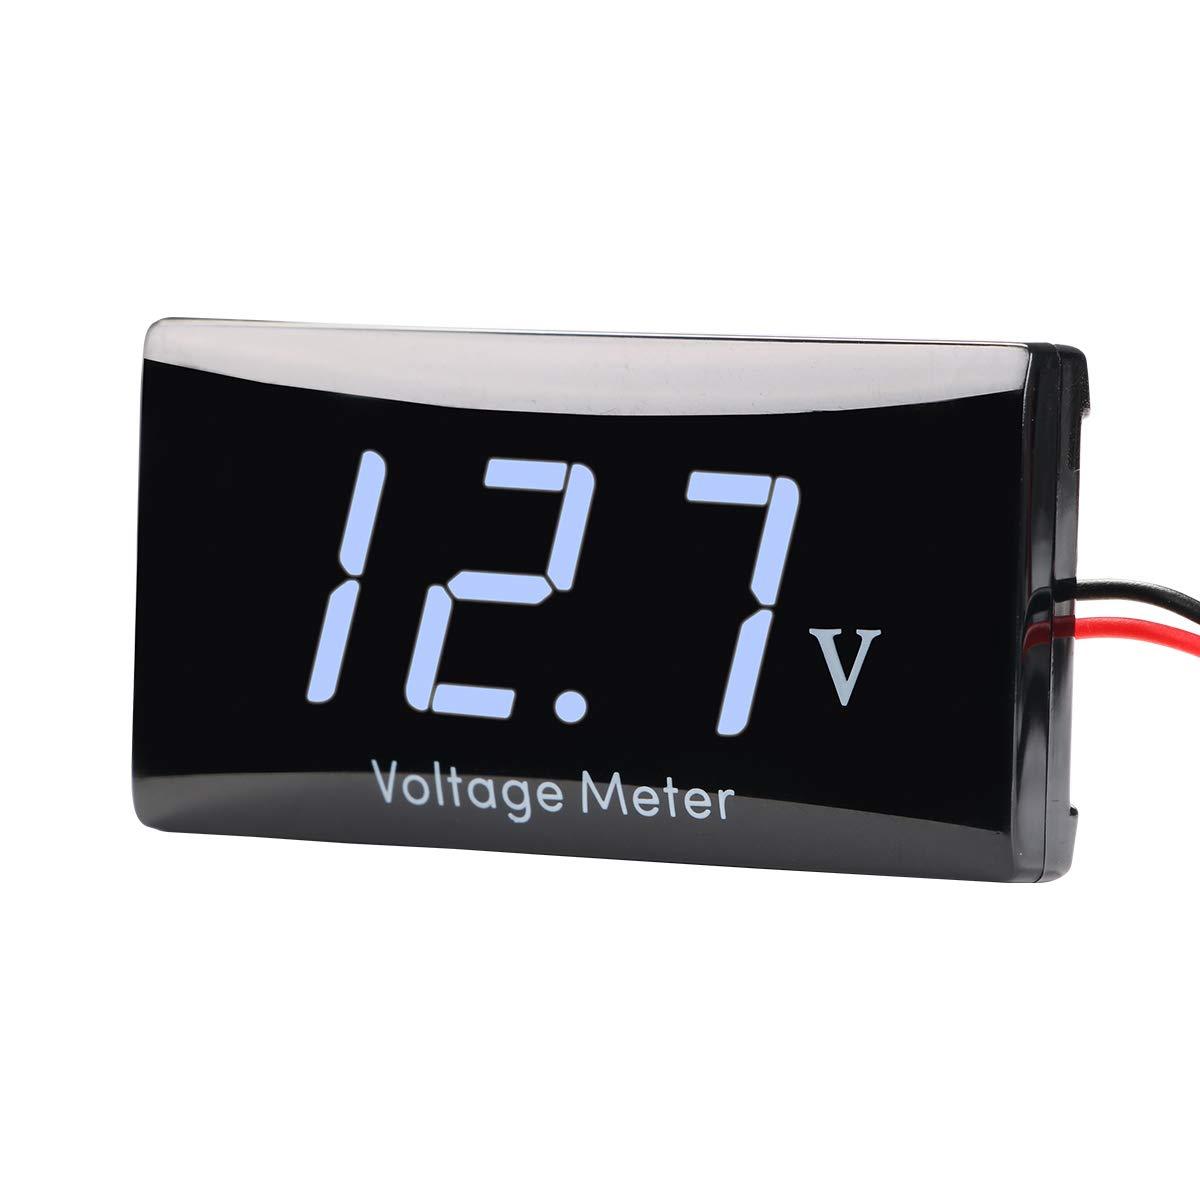 12 V Digital Spannungsanzeige Messger/ät Voltmeter f/ür Auto Motorrad AIMILAR DC 12 Volt Messger/ät rot